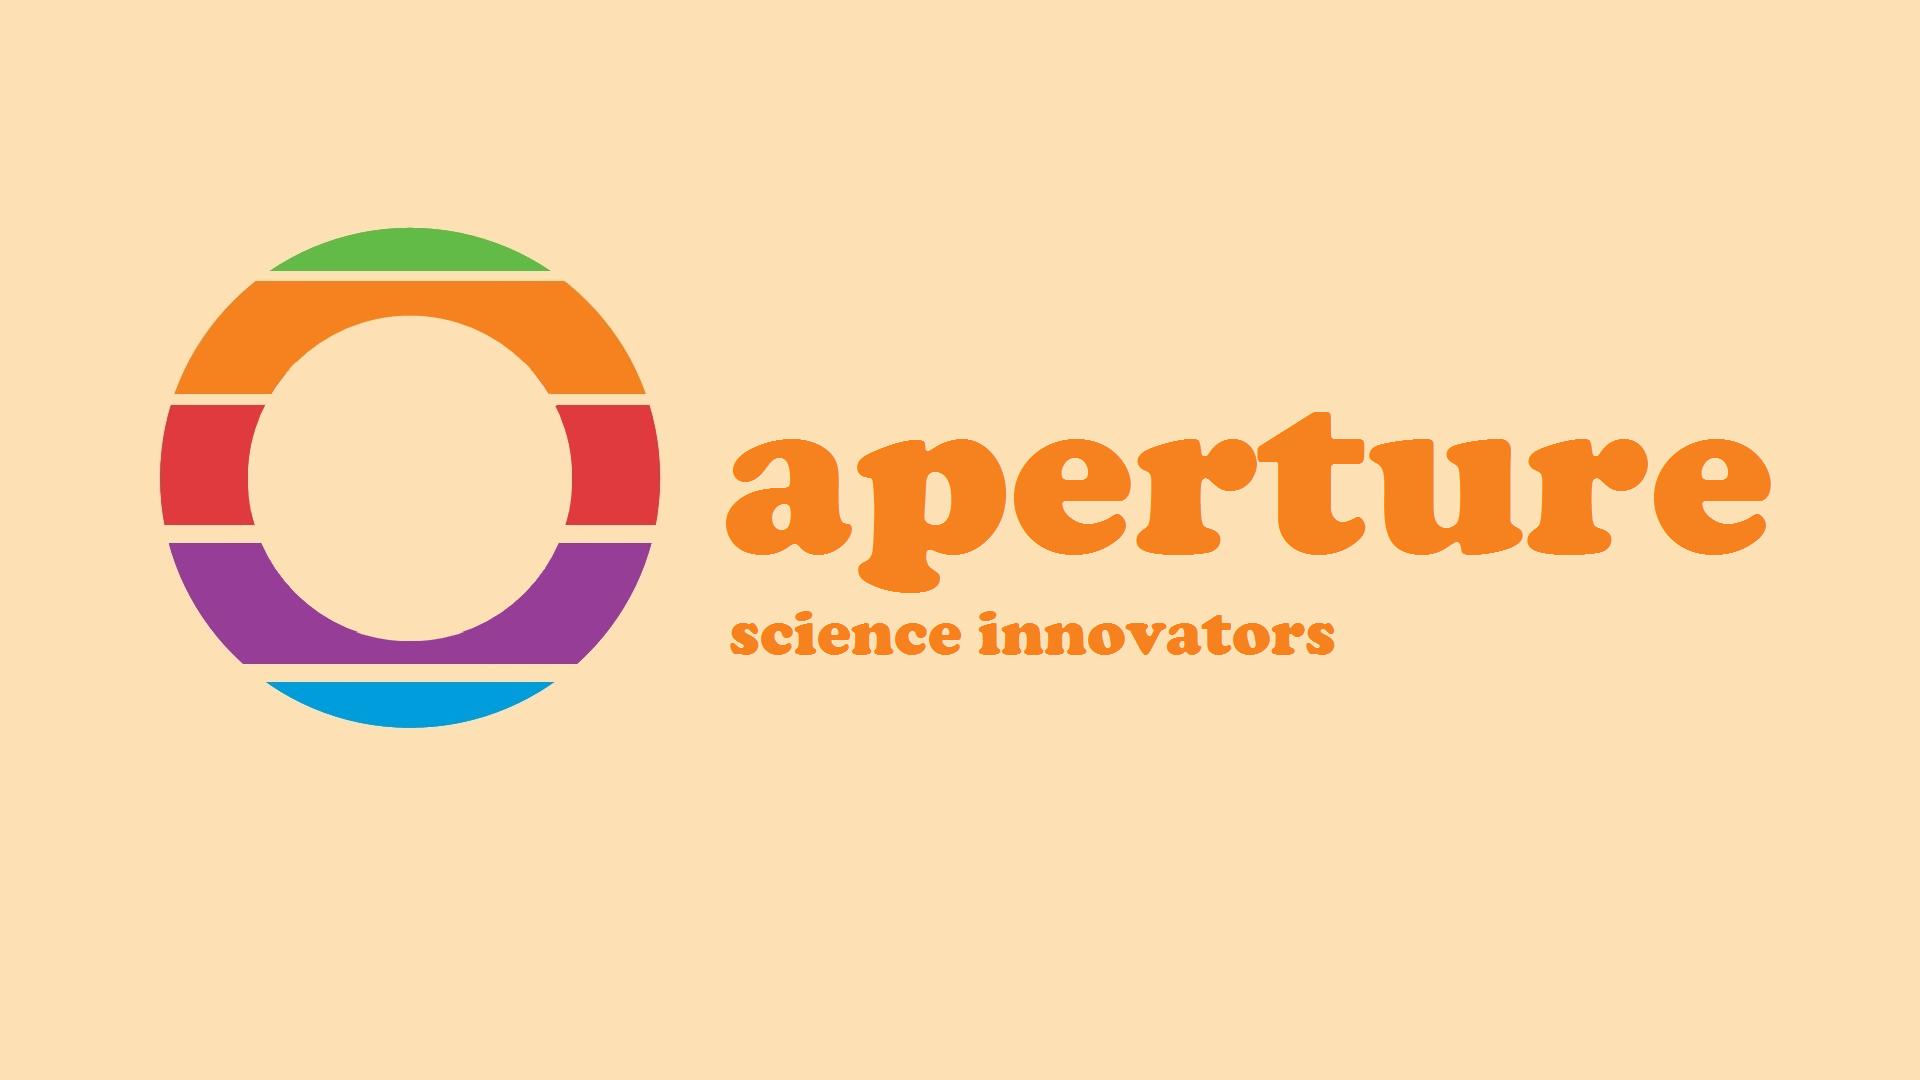 portal, retro, aperture laboratories, portal 2 - free wallpaper